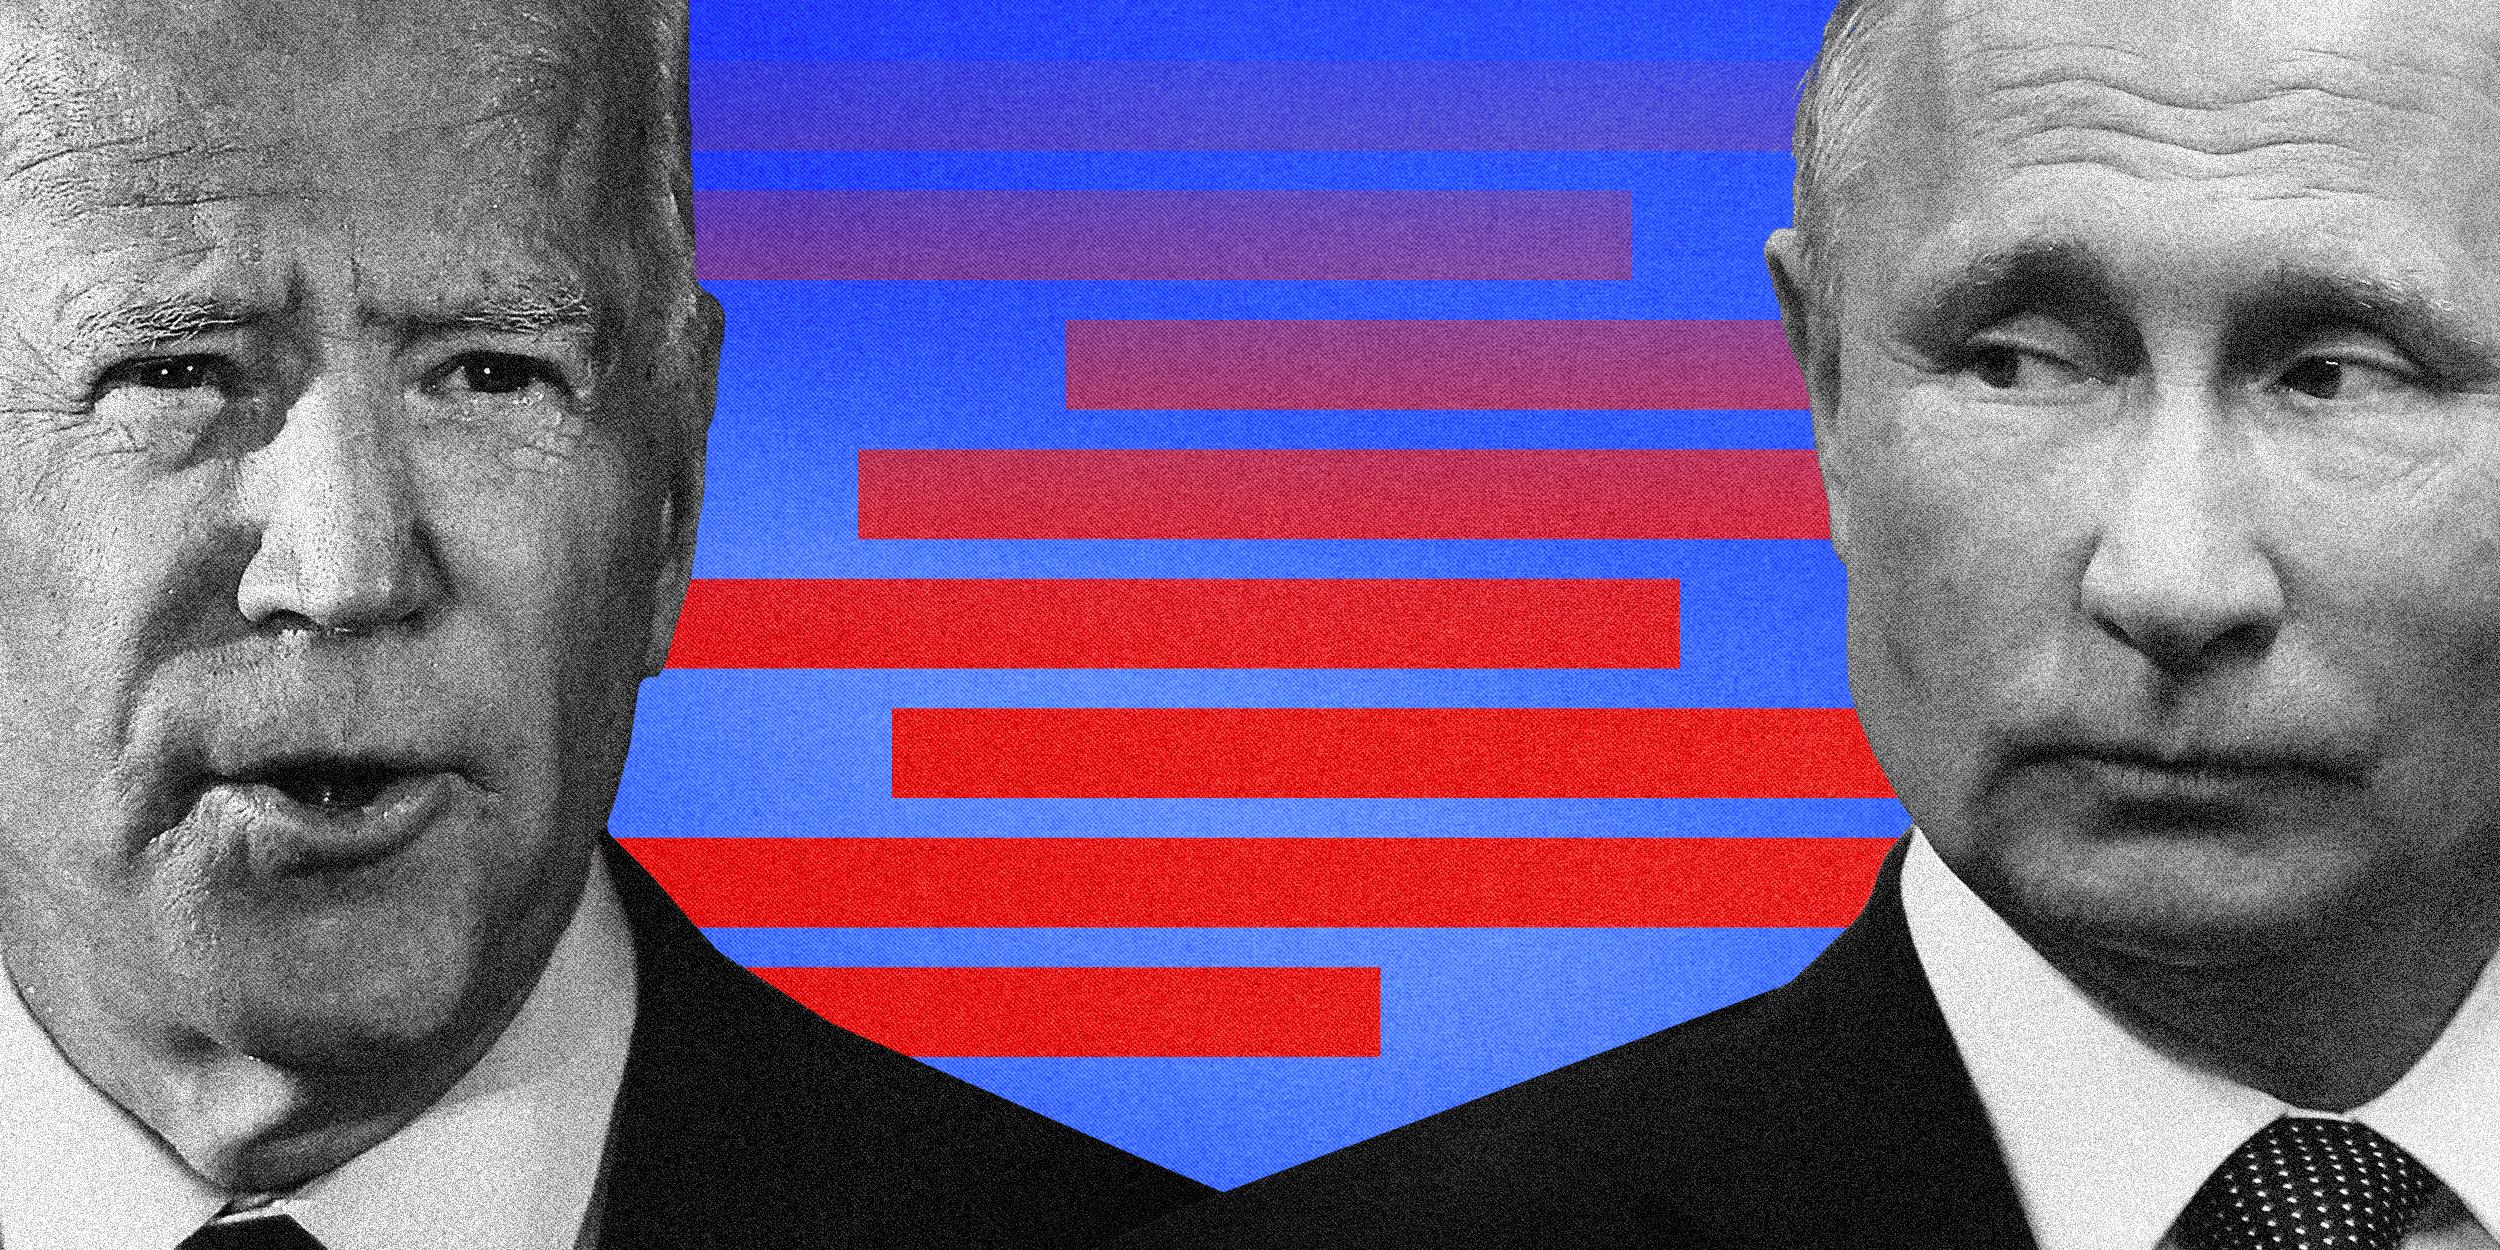 Putin is a modern-day czar. Biden can't treat him like anything else.